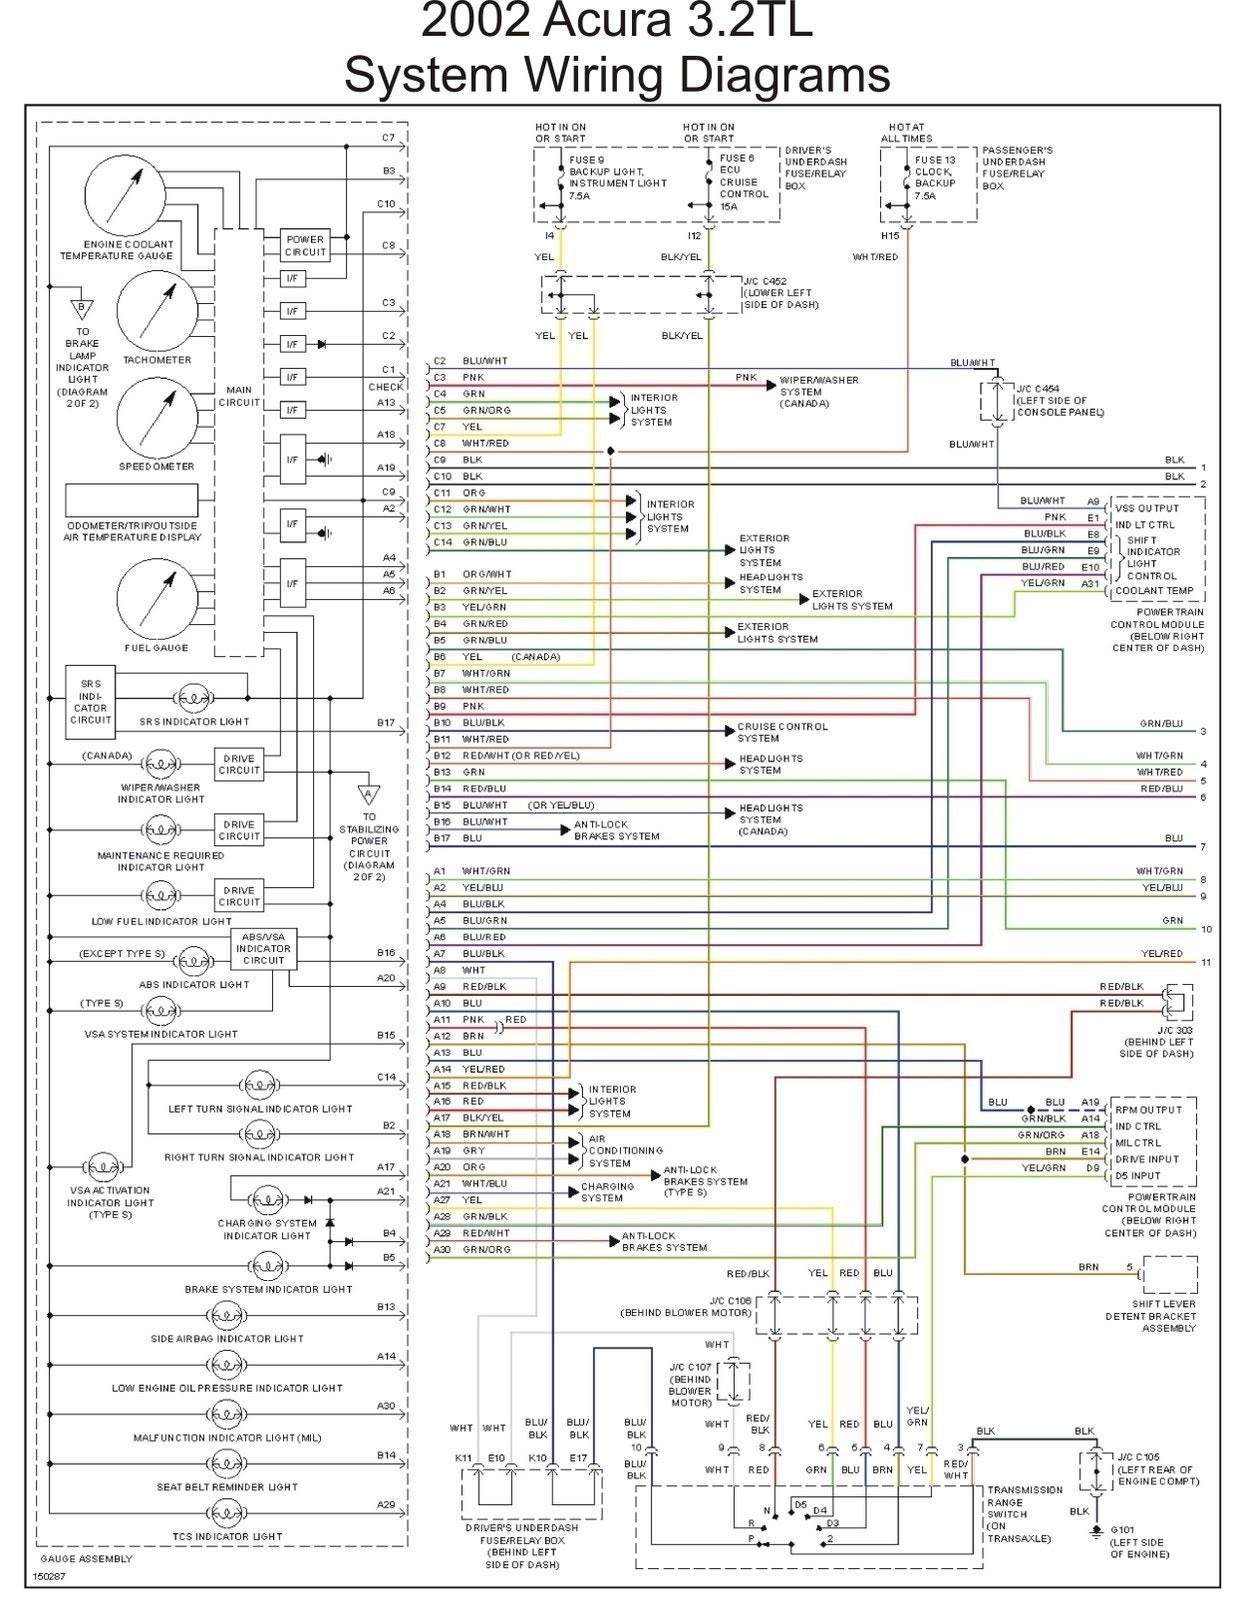 1991 Honda Accord Engine Diagram Best 2006 Honda Civic Relay Diagram • Electrical Outlet Symbol 2018 Of 1991 Honda Accord Engine Diagram